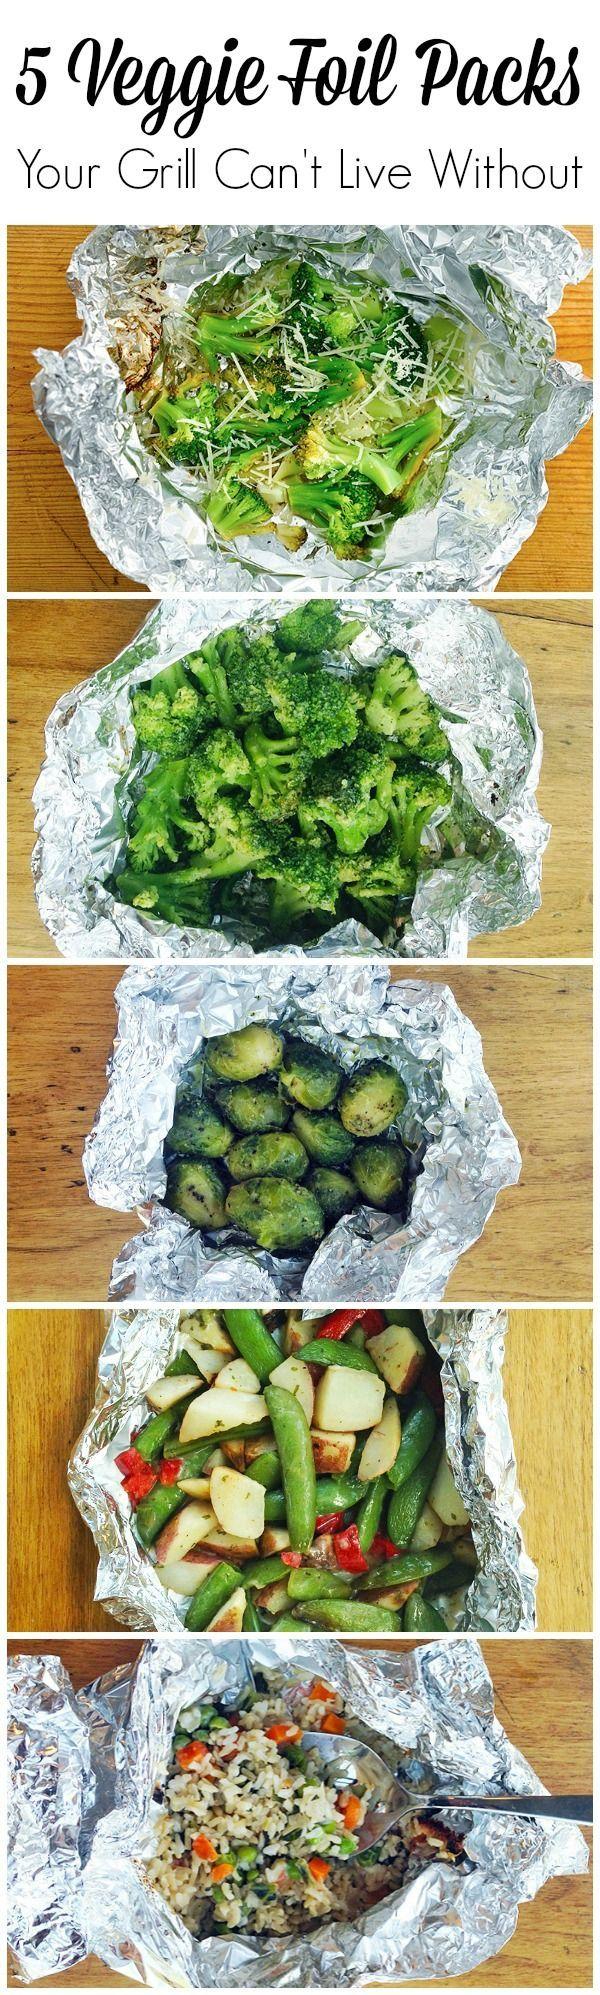 5 super yummy veggie foil packs for your grill make summer super easy!